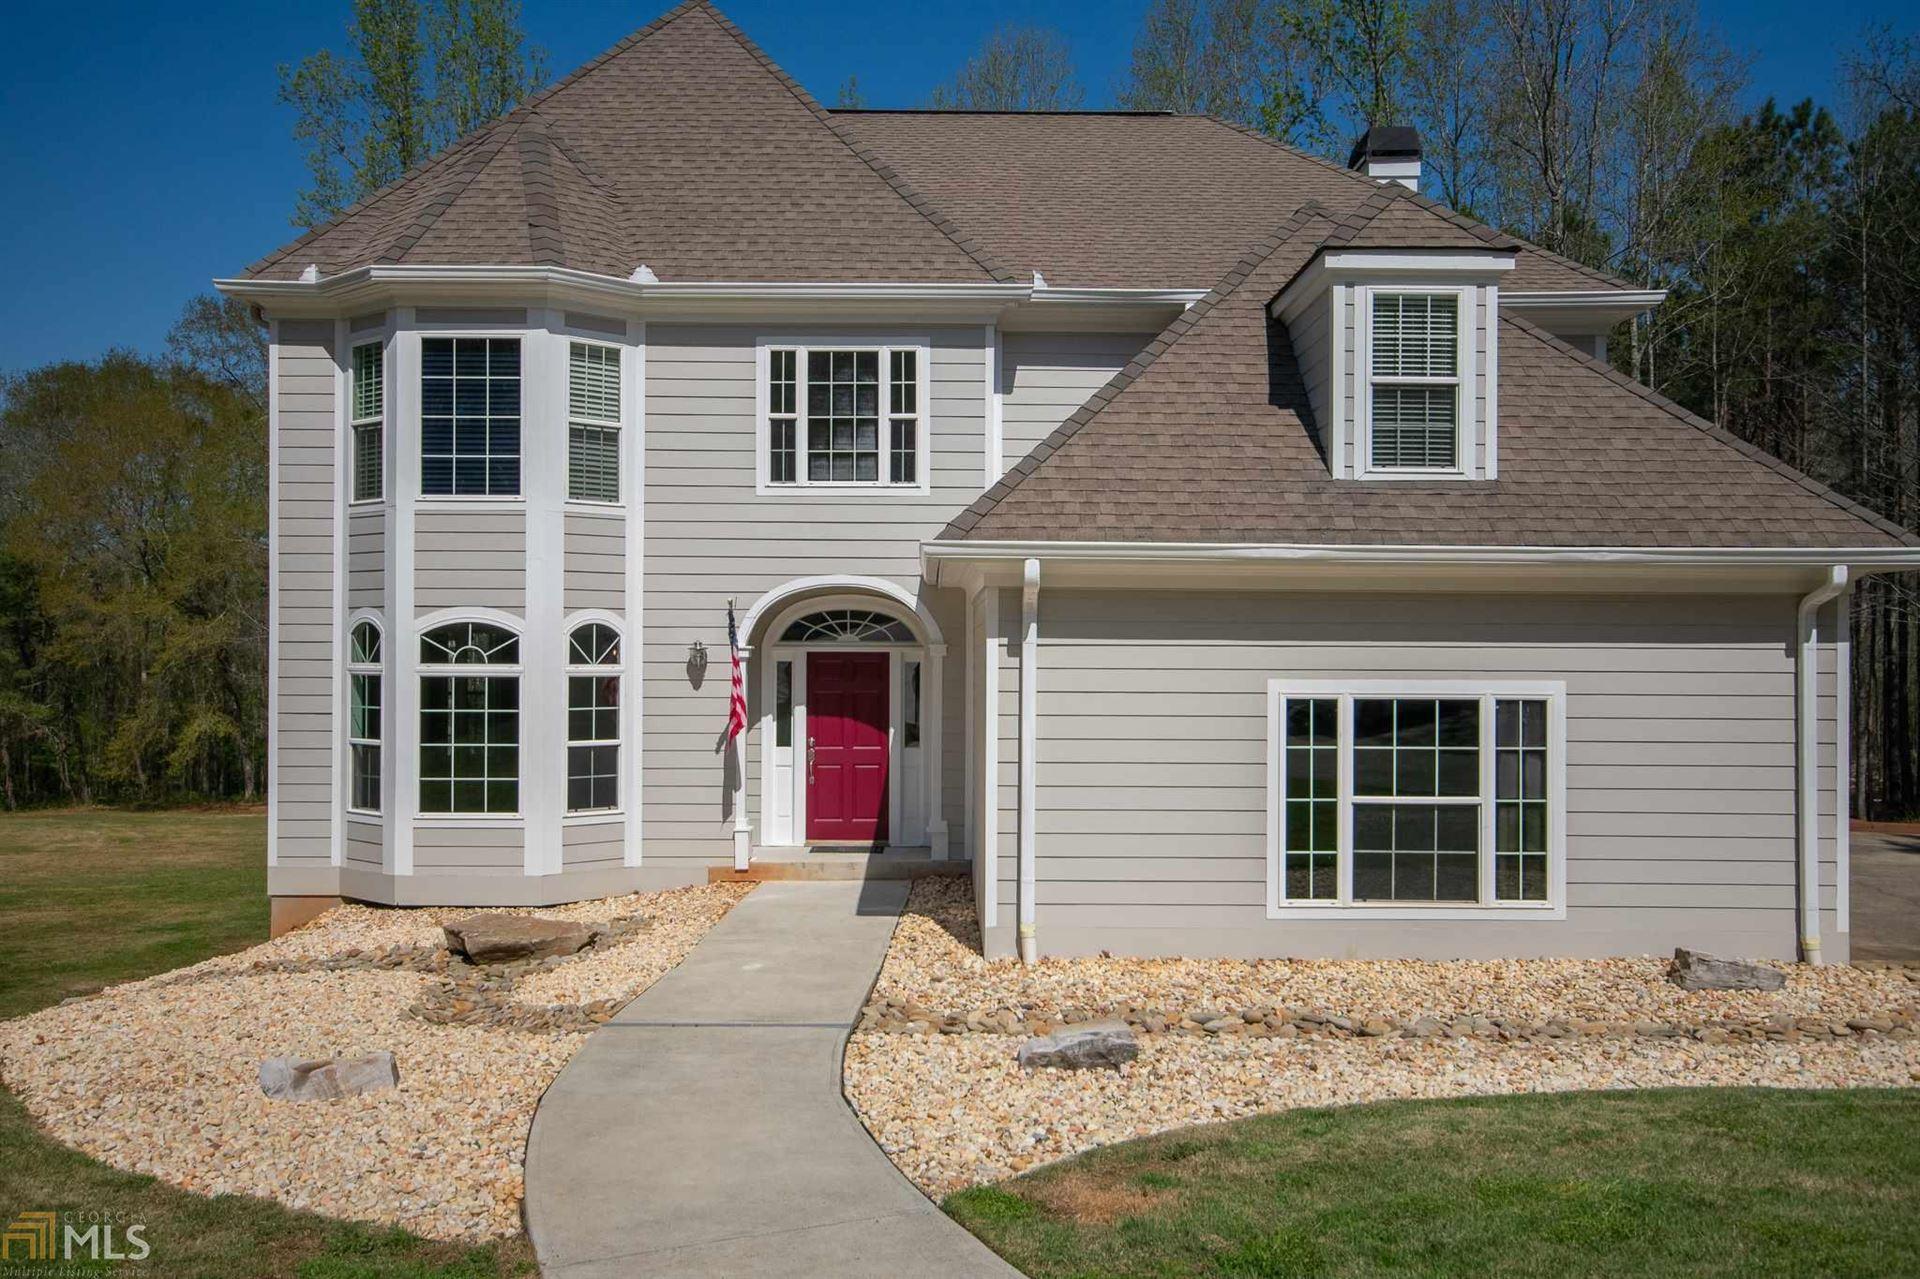 207 Hickory Chase, Carrollton, GA 30117 - #: 8956797